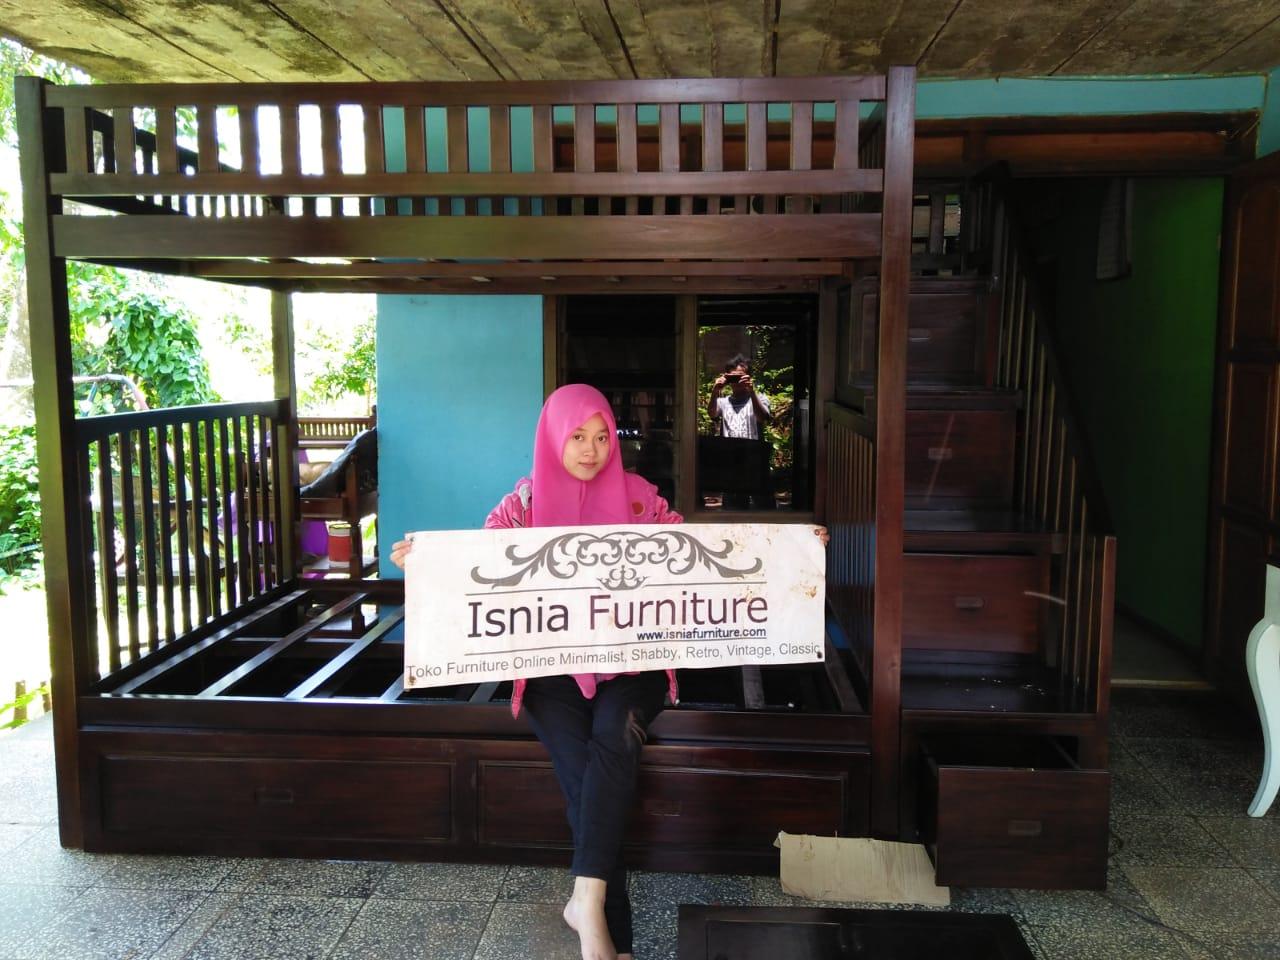 Tempat-Tidur-Tingkat-Jakarta 79 Model Ranjang Tempat Tidur Tingkat Kayu Minimalis Harga Murah